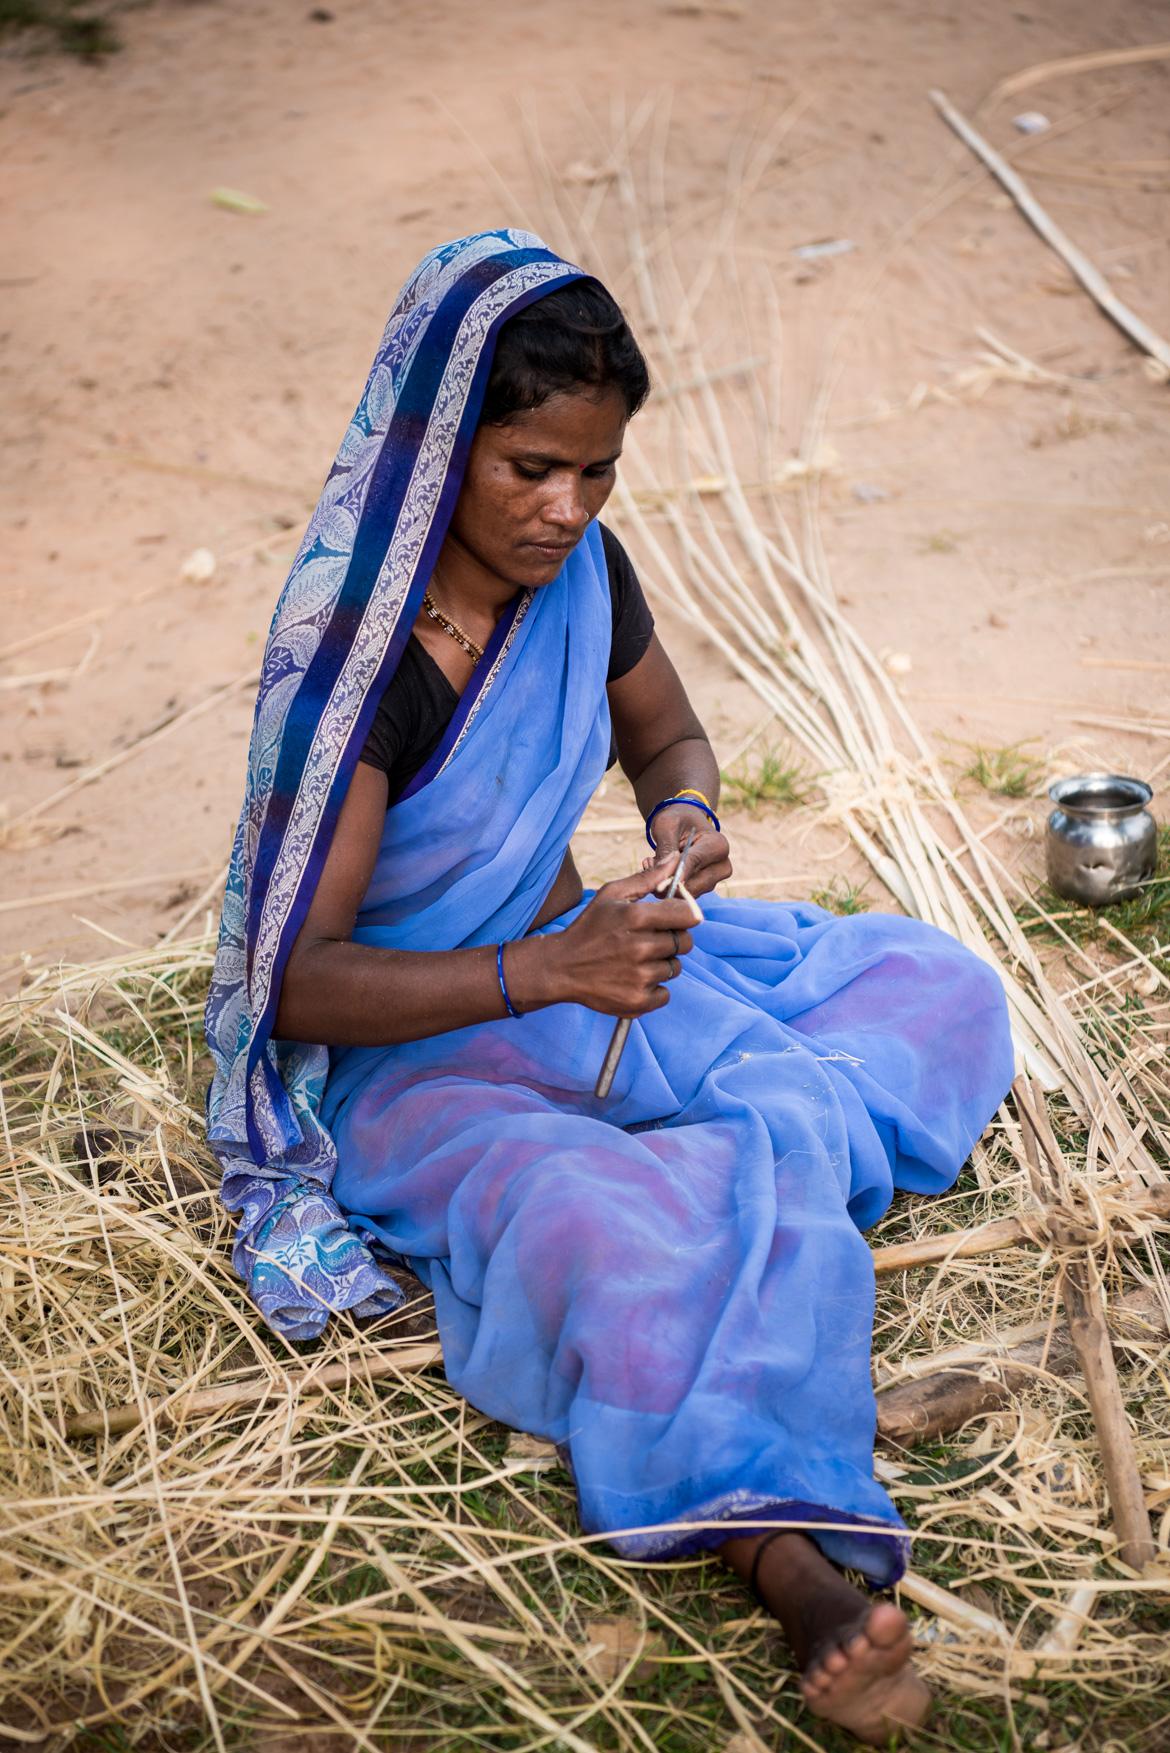 A woman making a bamboo basket in Tala village of Bandhavgarh